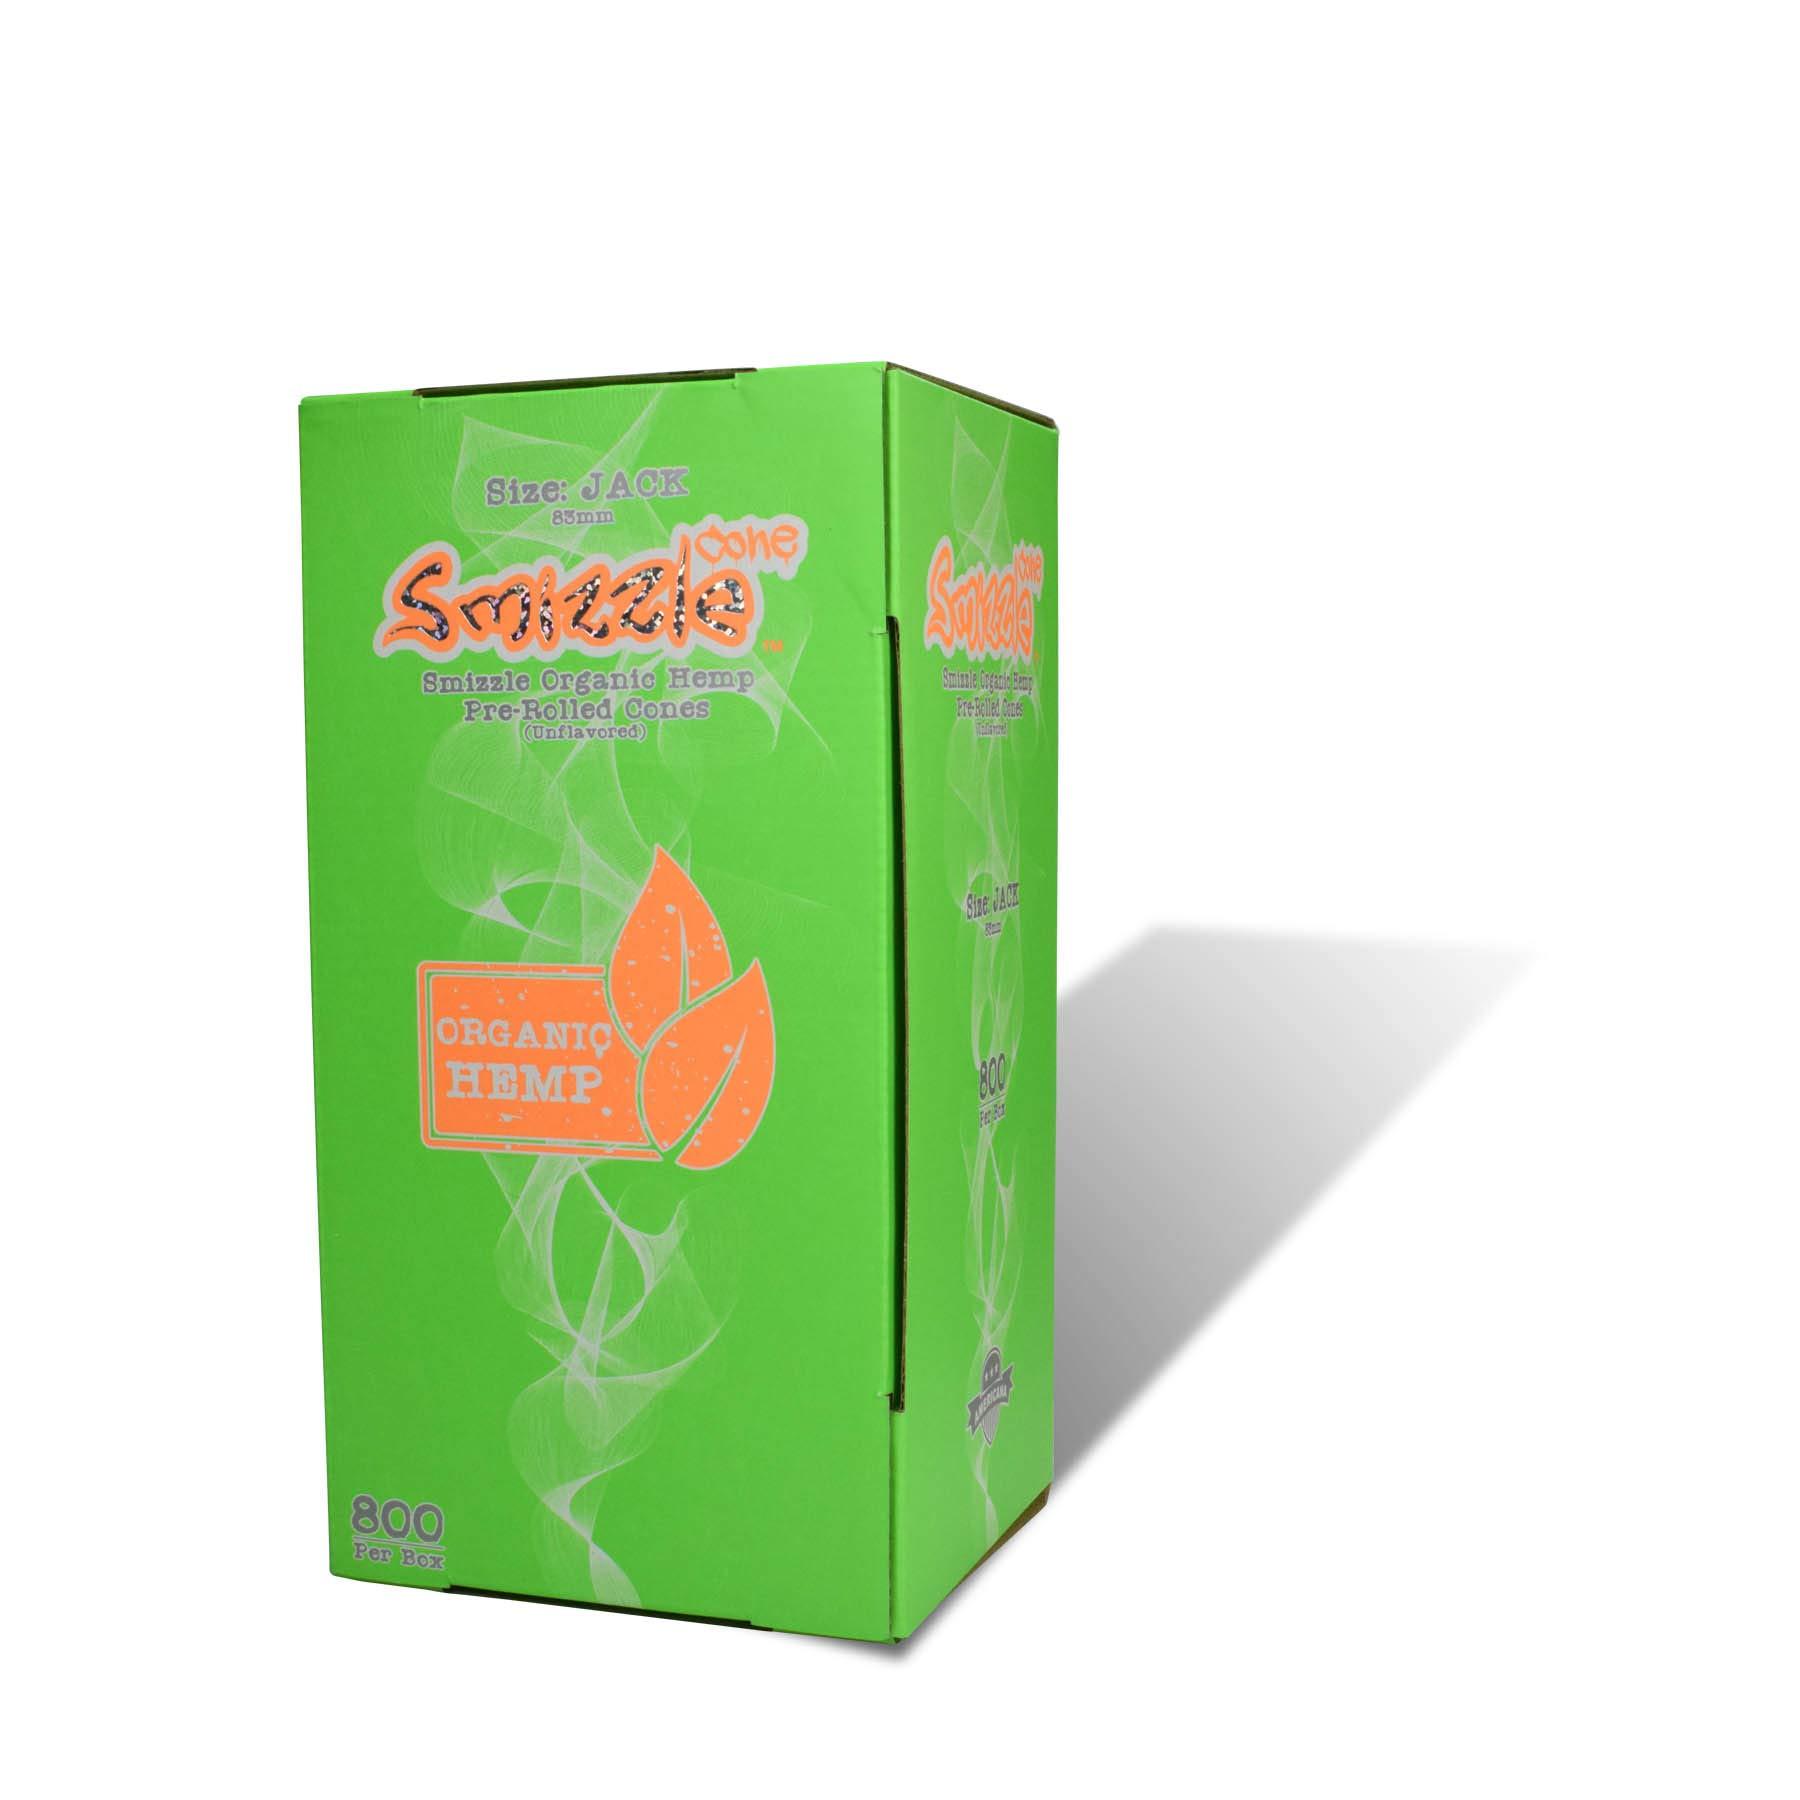 SMIZZLE 800 ct Pre-Rolled Organic Hemp Cones, Jack 1-1/4 (83mm) Tower Bulk Pack Tower Bulk Pack for Dispensaries